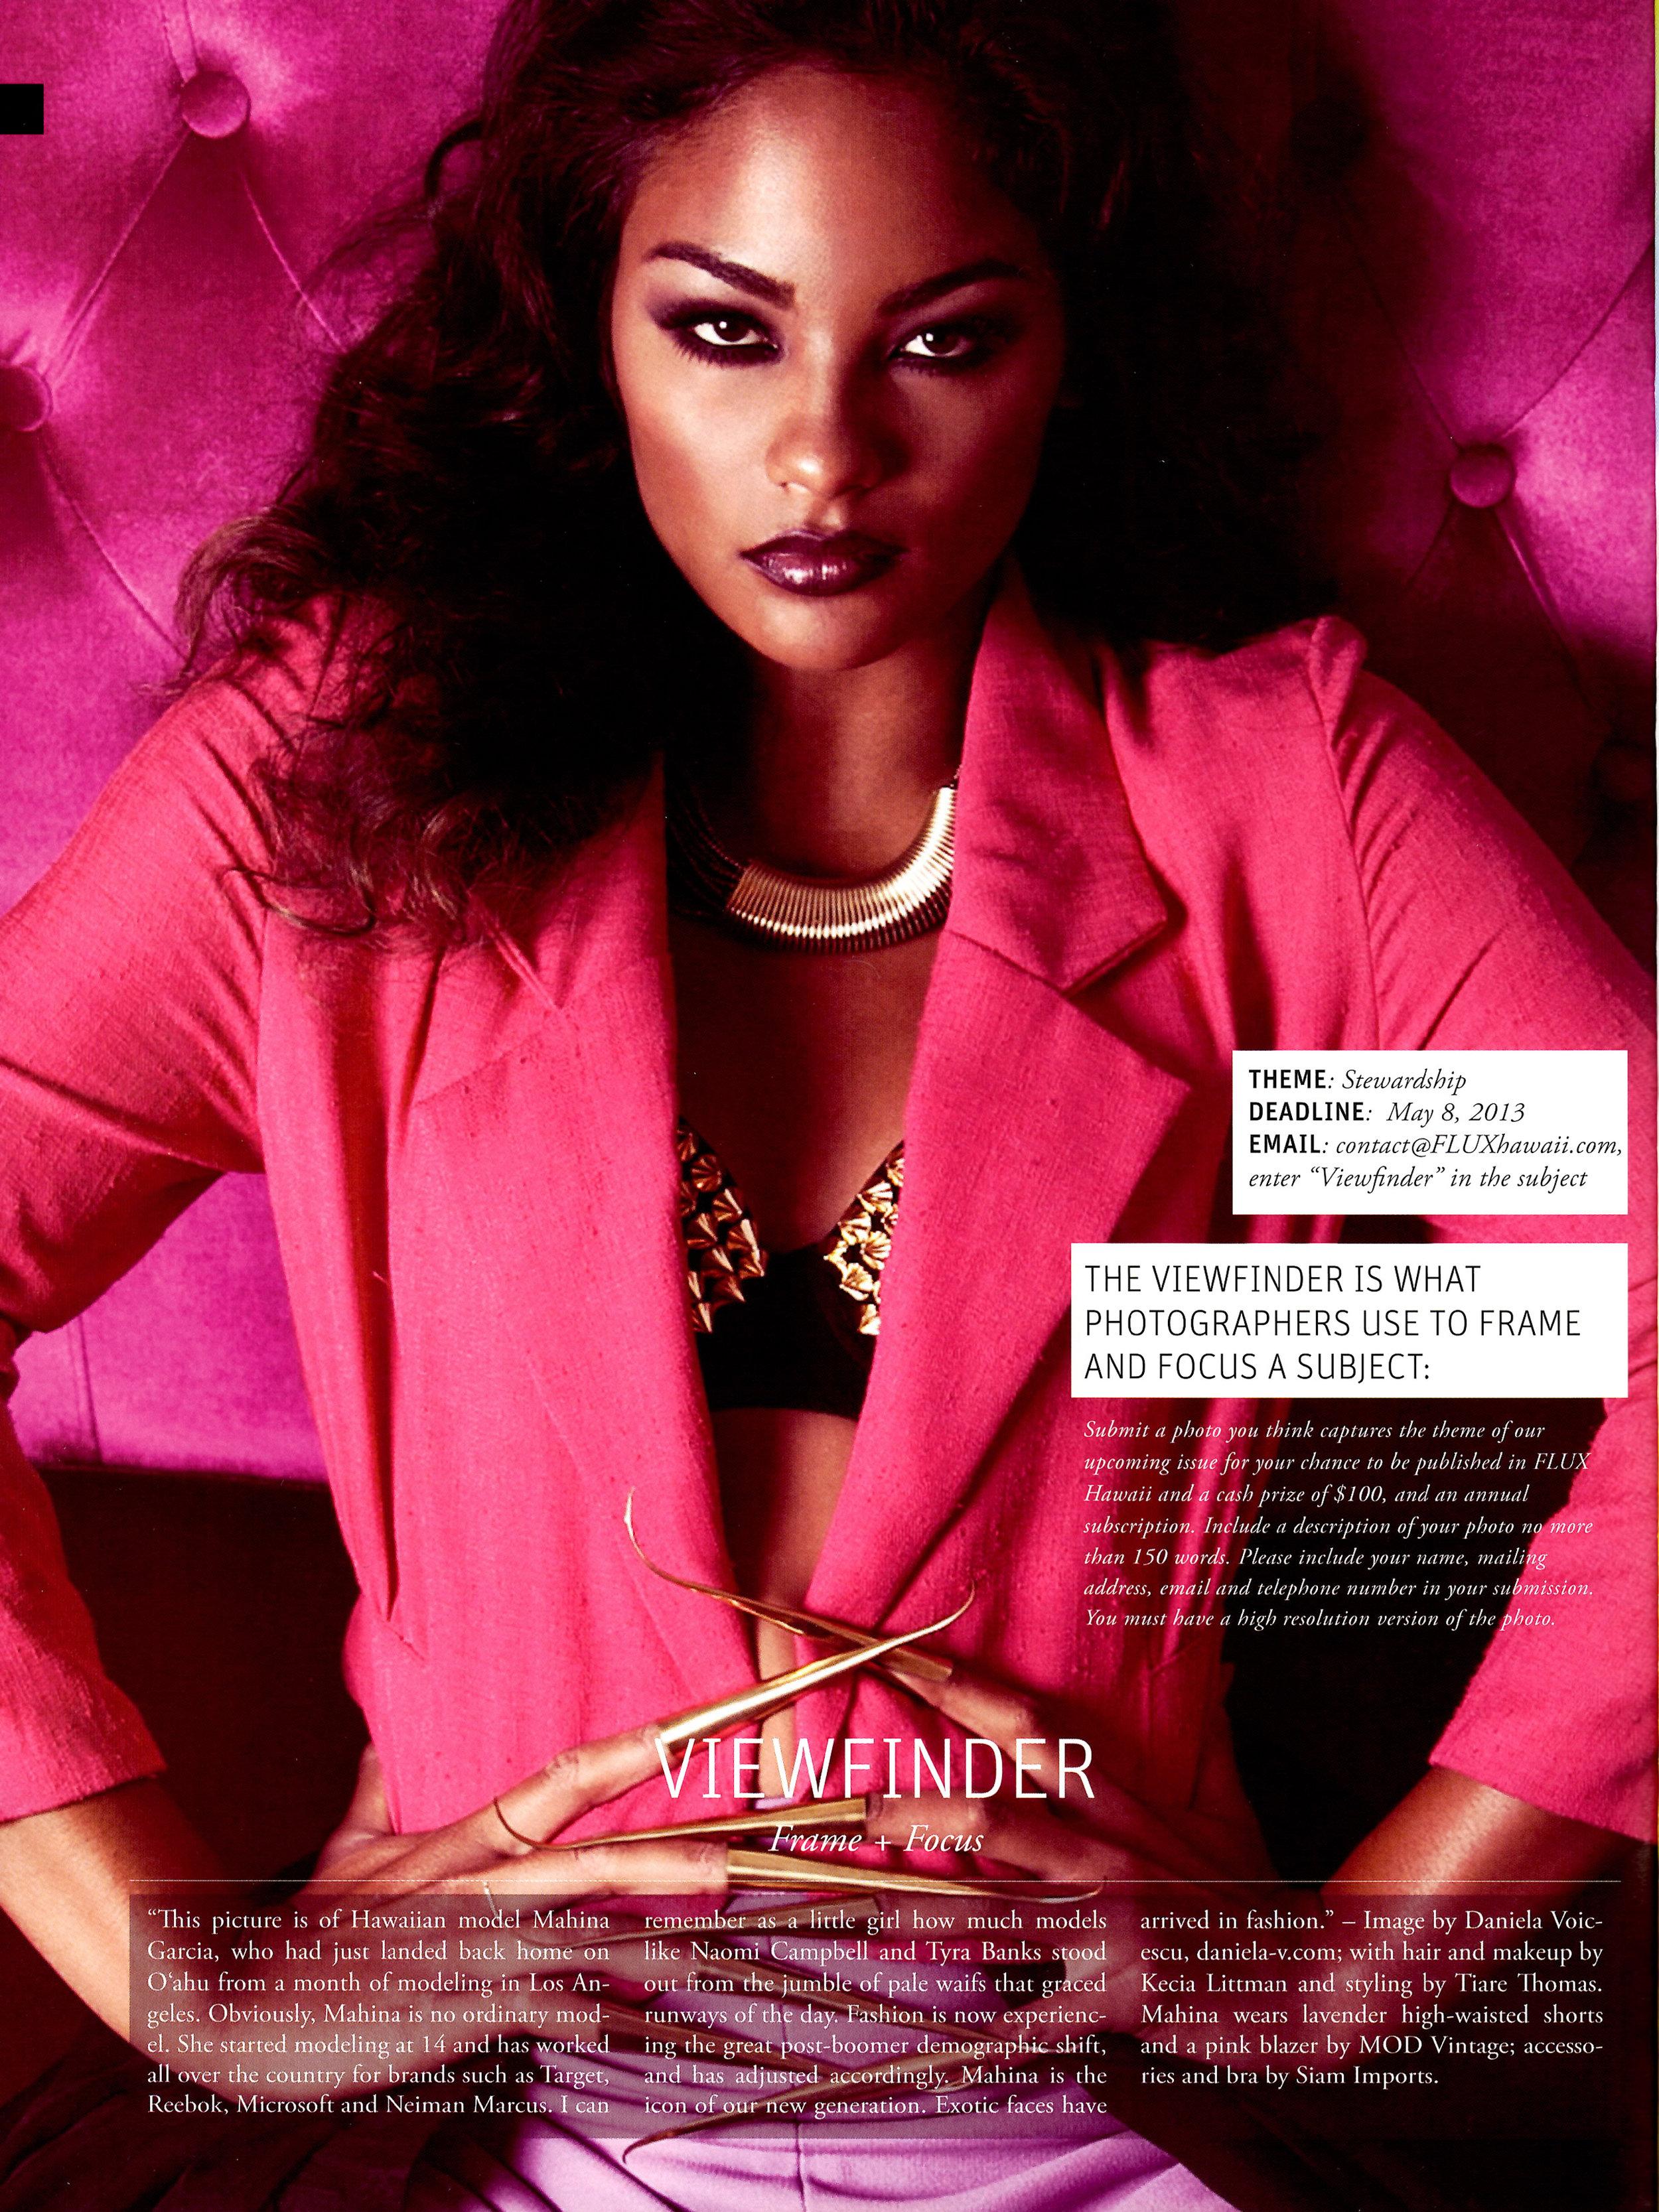 Mahina Flux Magazine Kecia Daniela Tiare Pink funky print.JPG